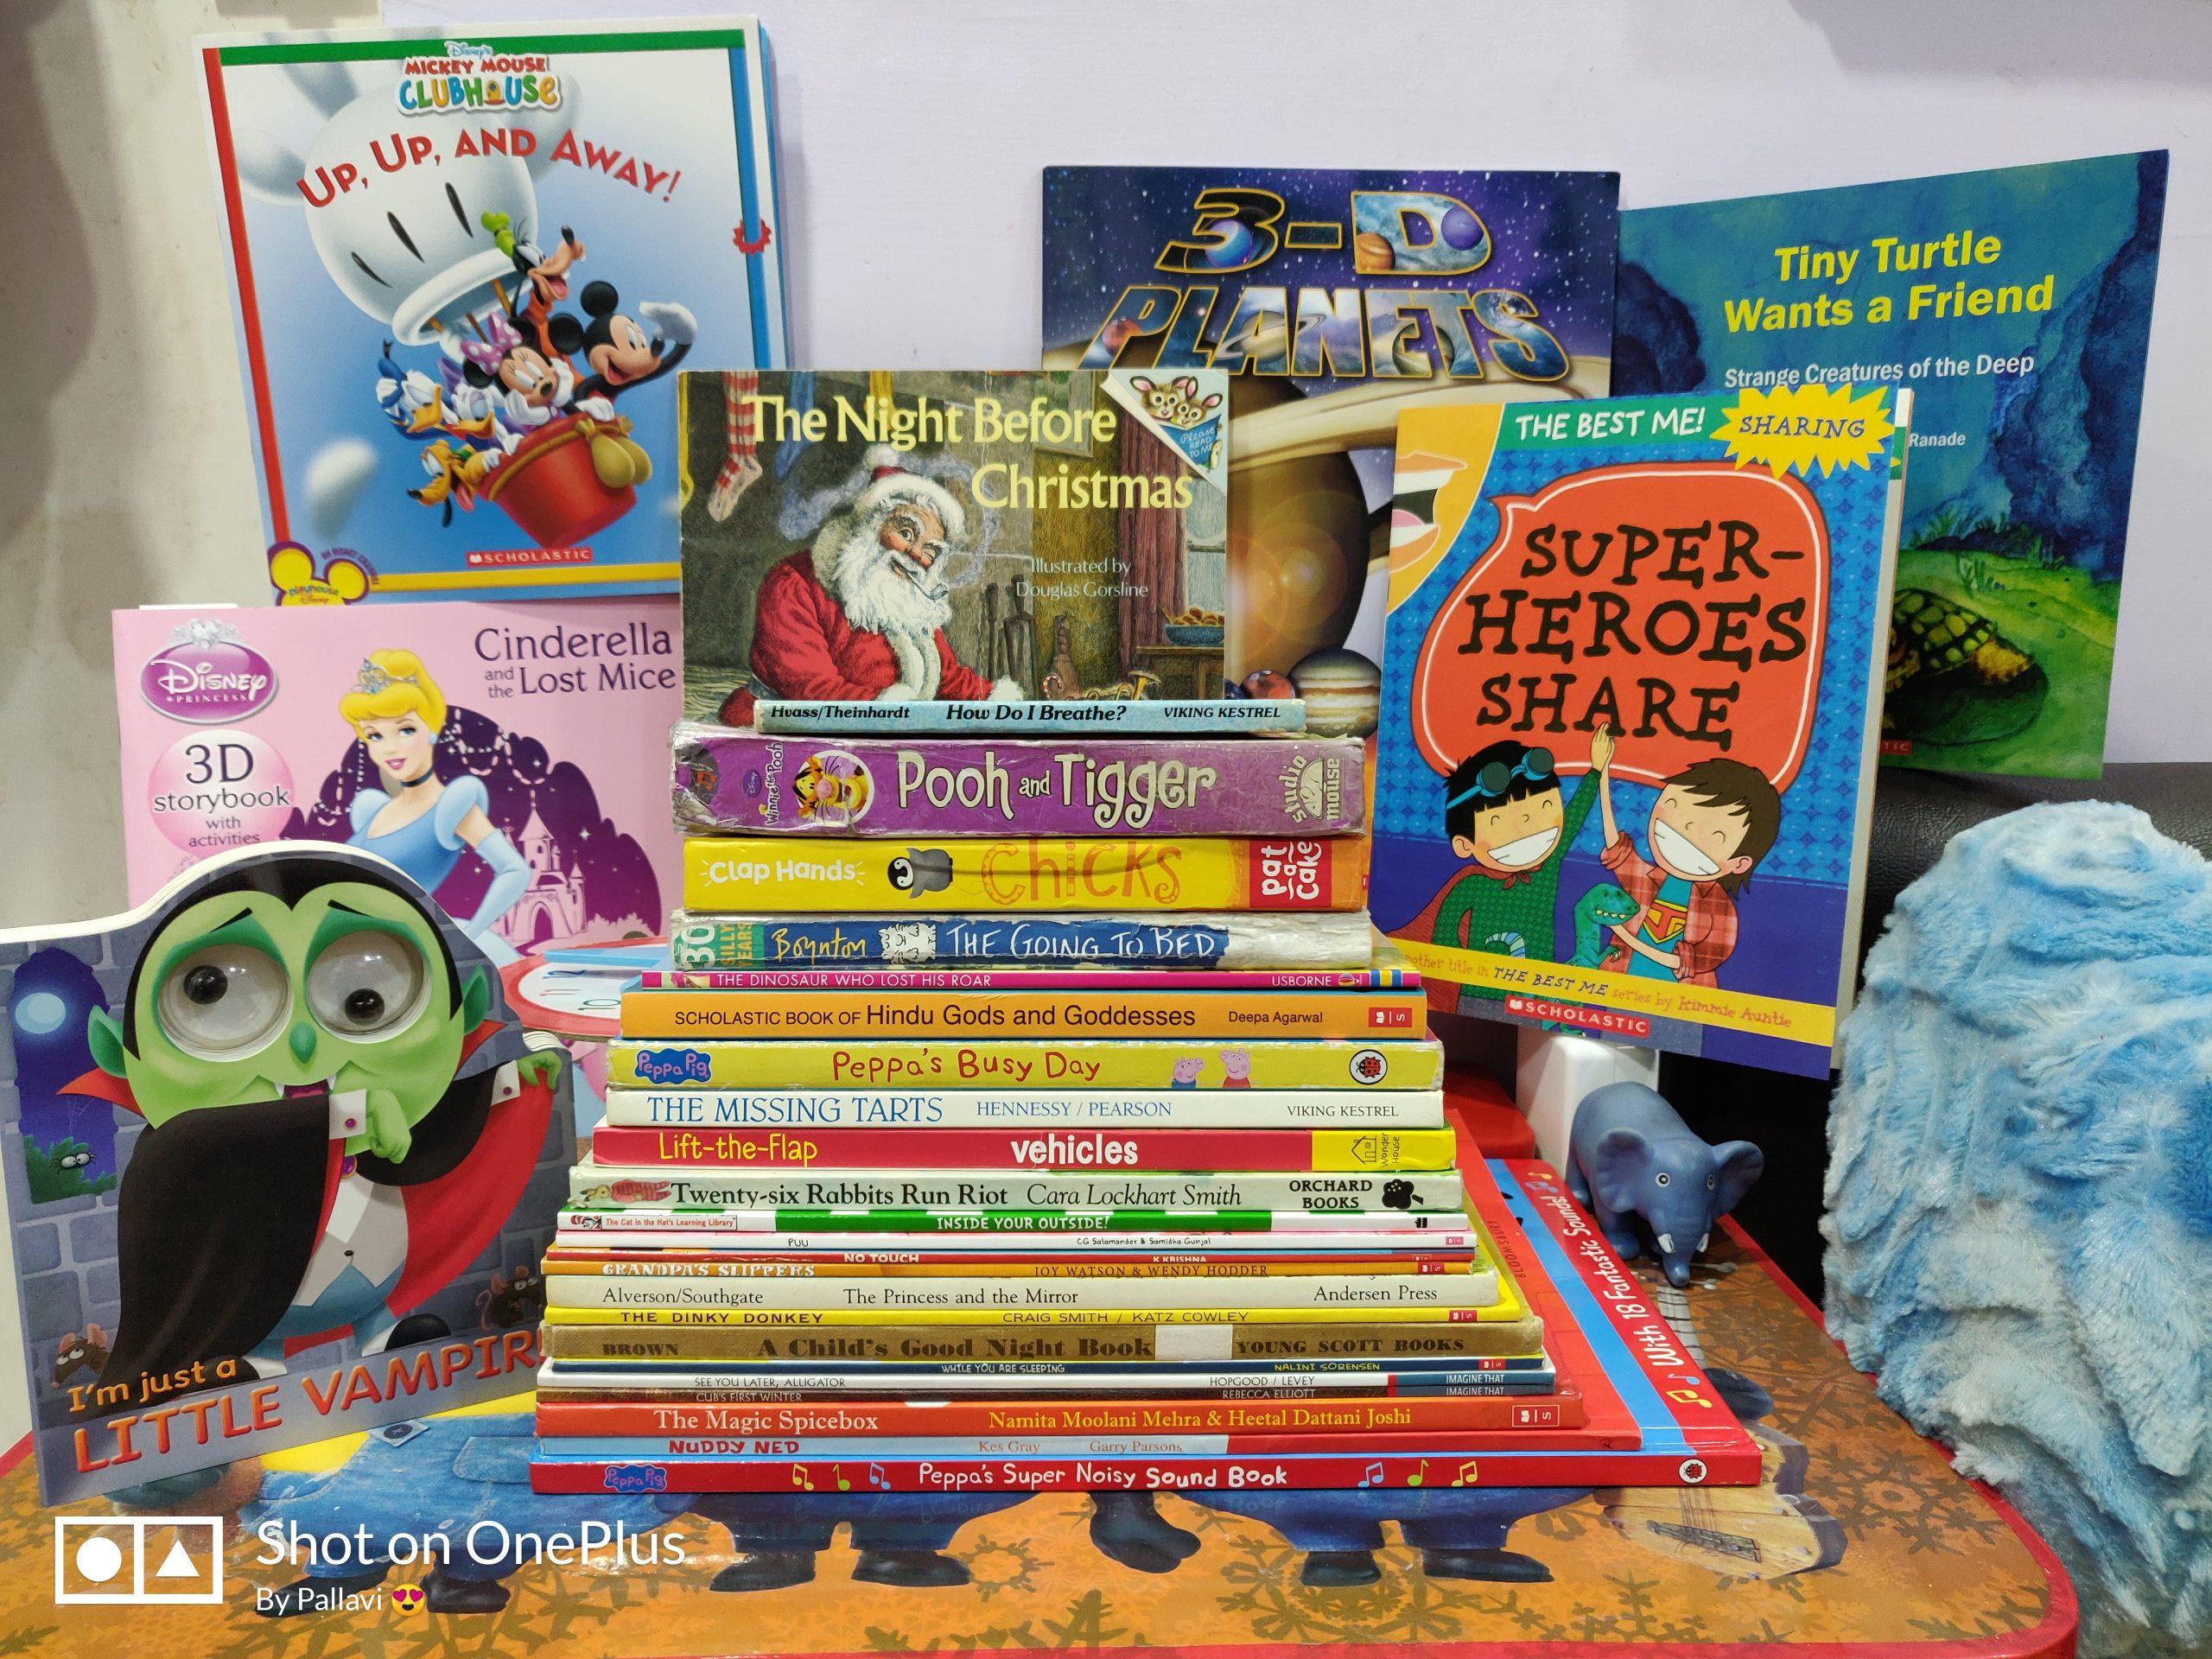 Yuvaan's Super 30 for 3 year olds #kbcBookBingoJr